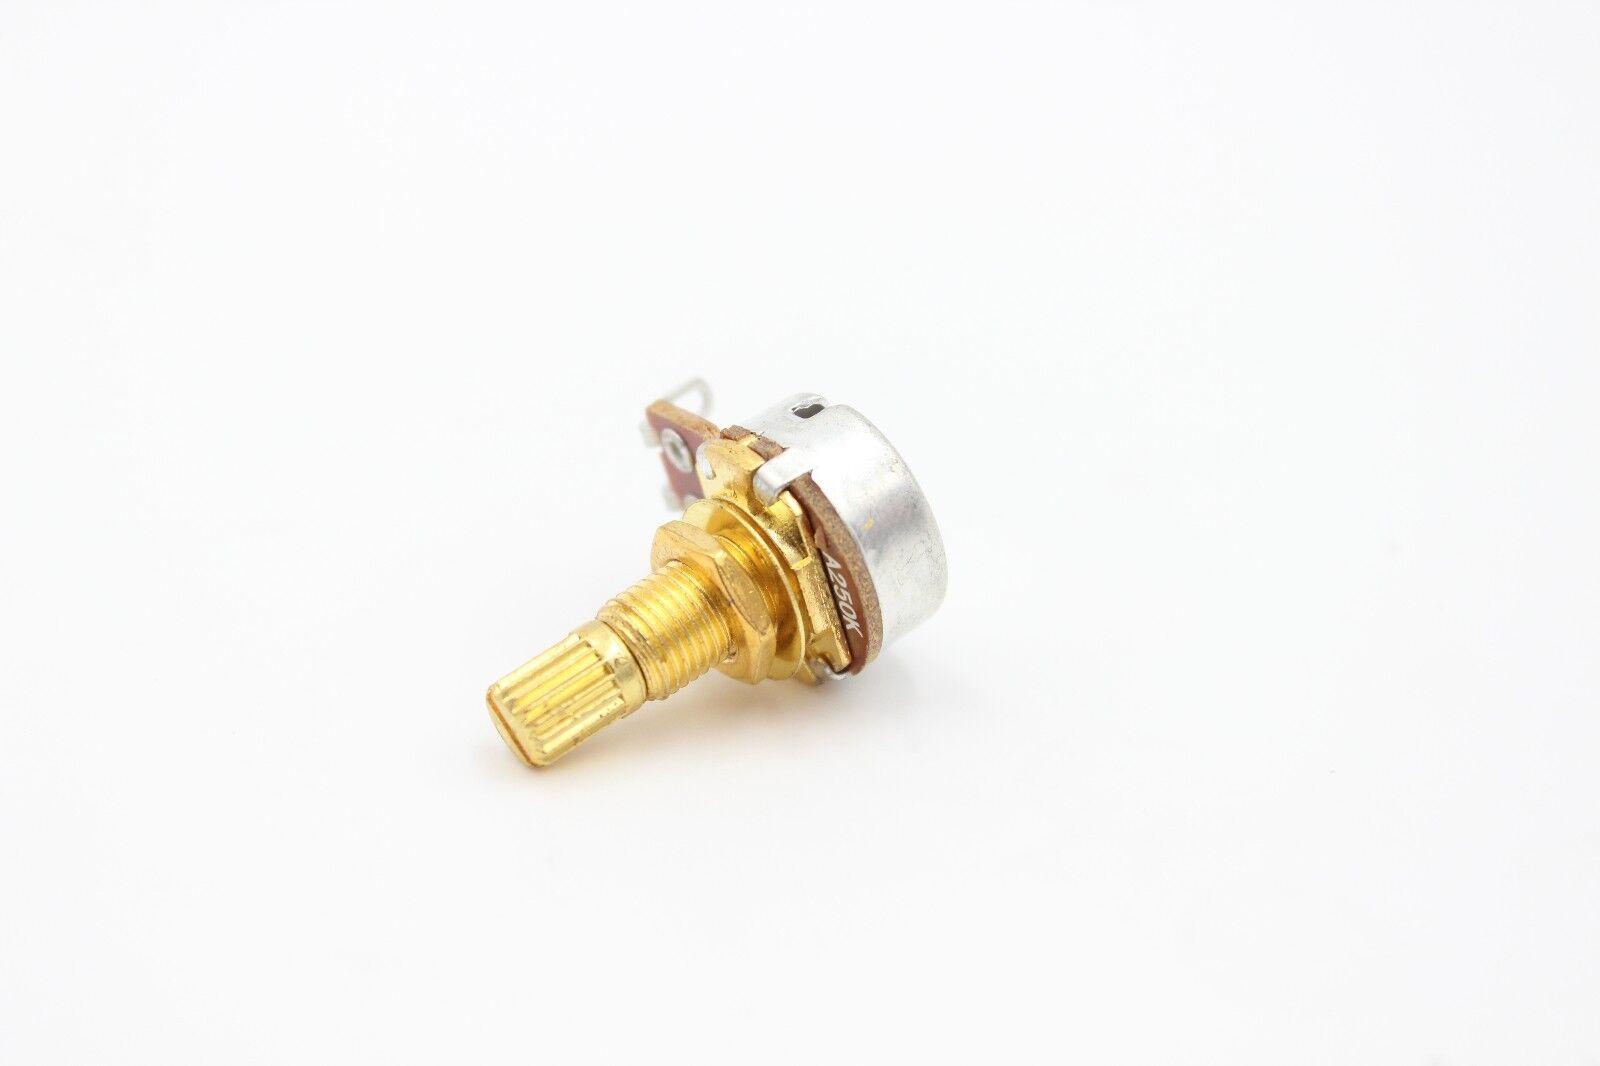 1 A250 Audio Taper Gold Strat Mini Volume Pot 18mm Shaft For Guitar - $5.99